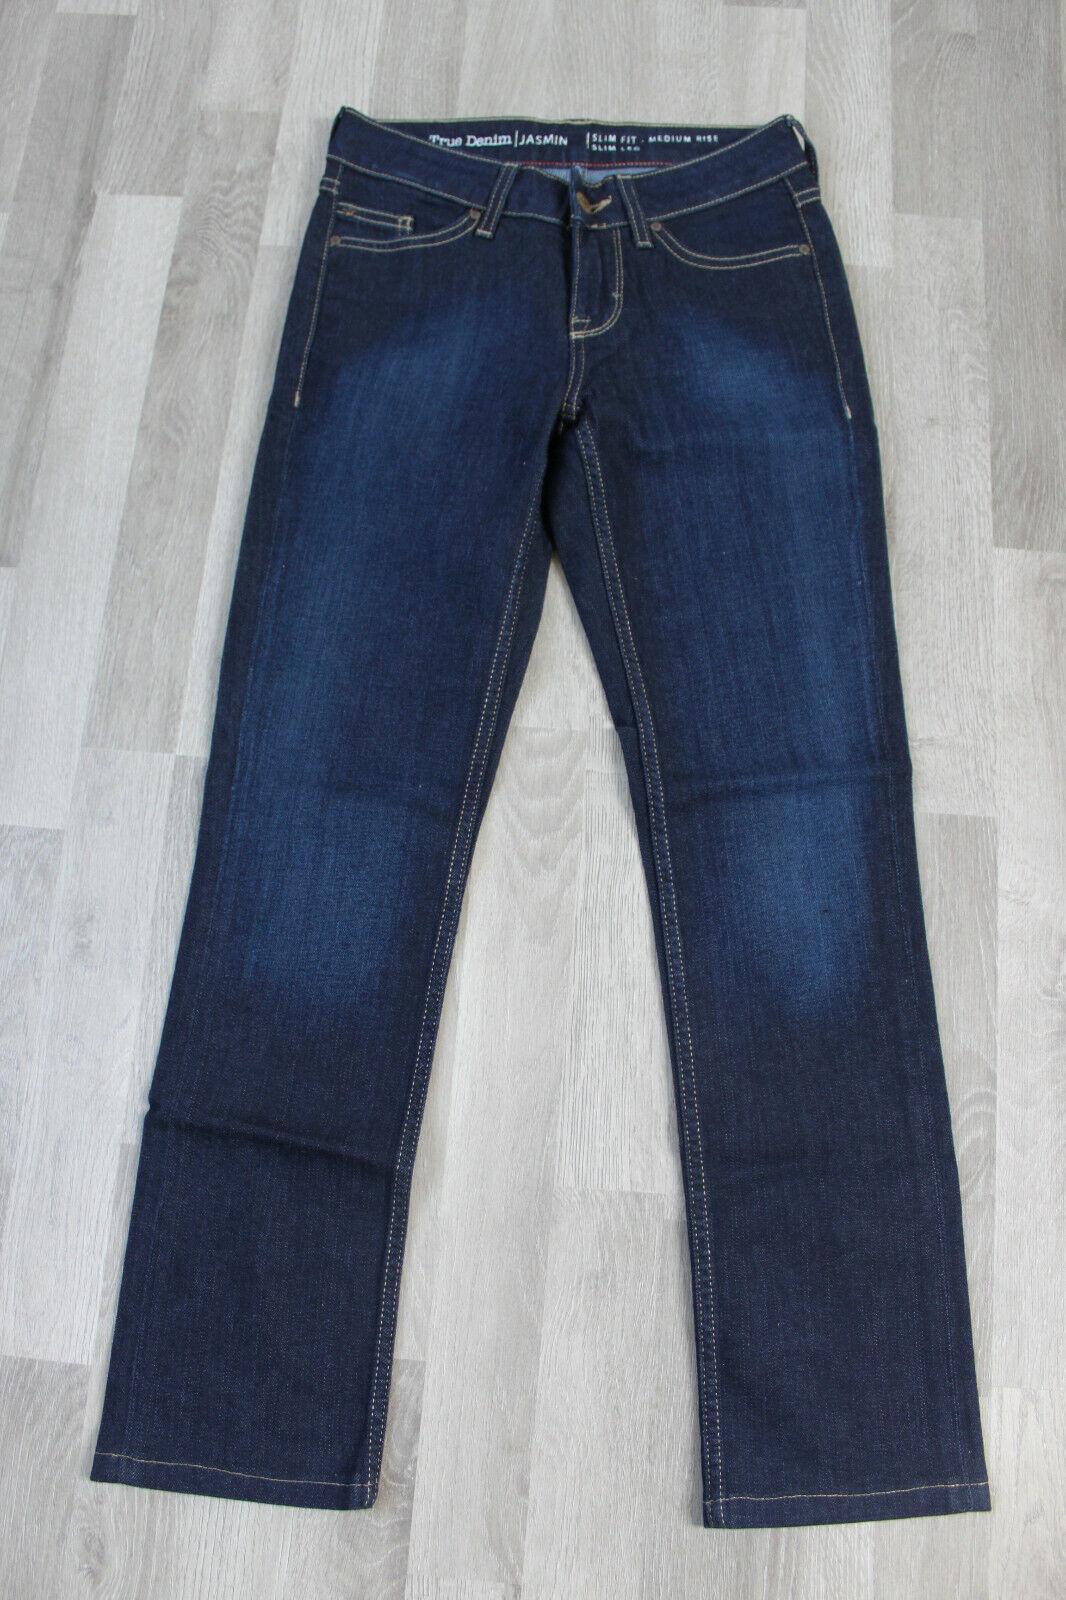 Mustang Hose Damenhose Jeanshose Jeans Jasmin slim fit, medium rise, dunkelblau,